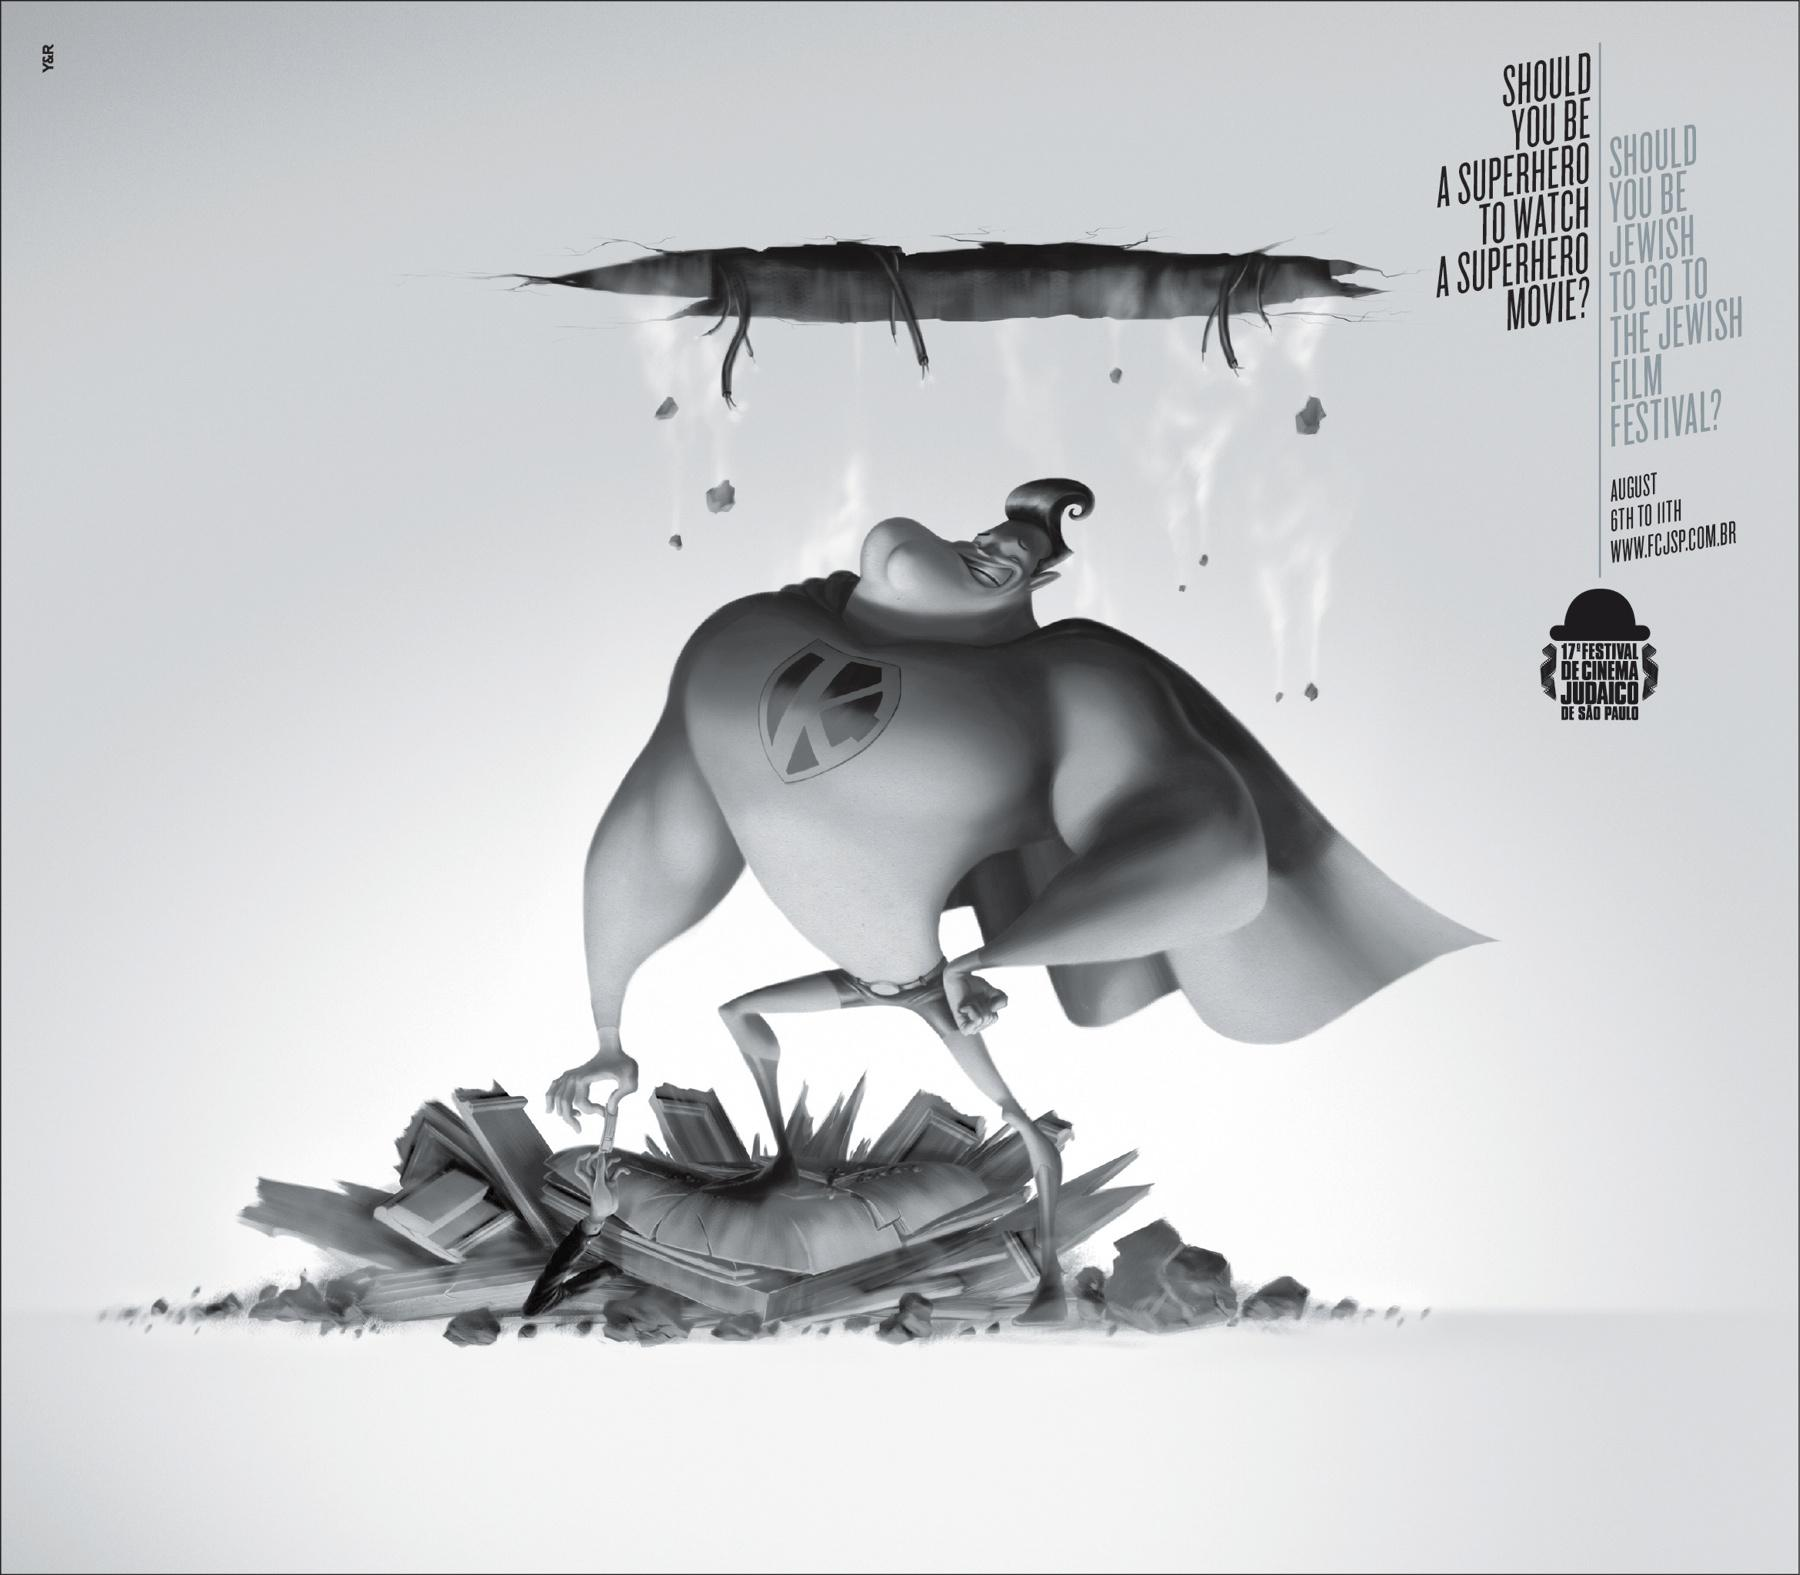 Jewish Film Festival Print Ad -  Superhero